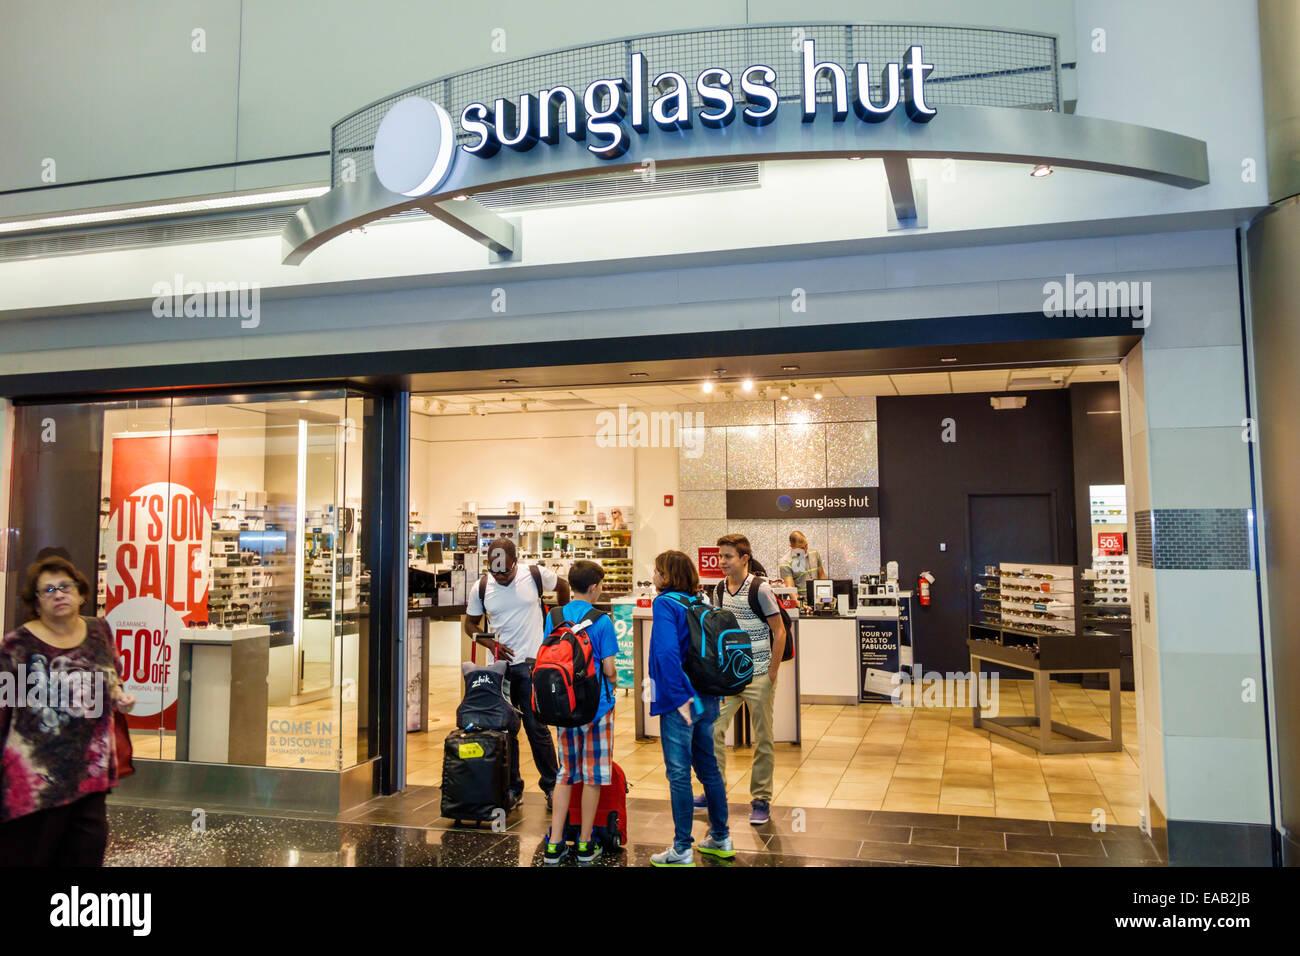 54837940901 MiamiMiami Florida International Airport MIA terminal concourse gate area  shopping front entrance sunglass hut store business sunglasses